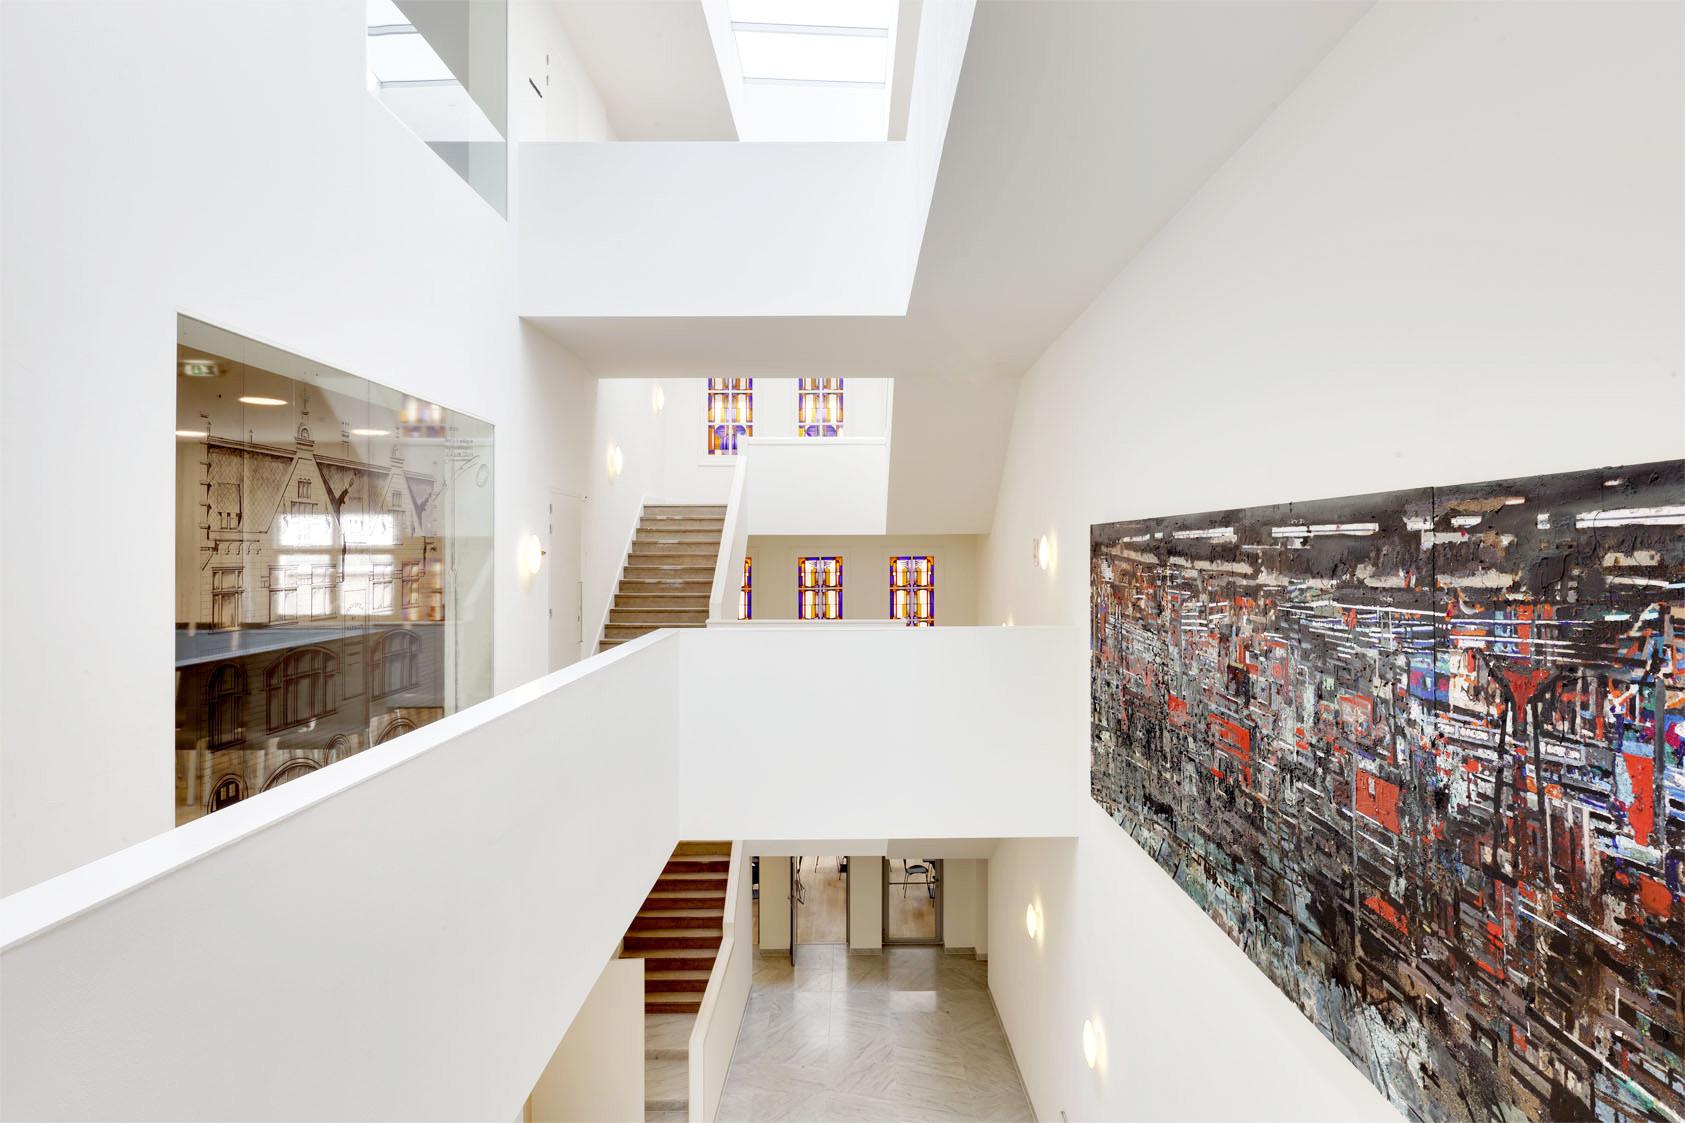 De Nieuwe Liefde / Wiel Arets Architects, Courtesy of  wiel arets architects